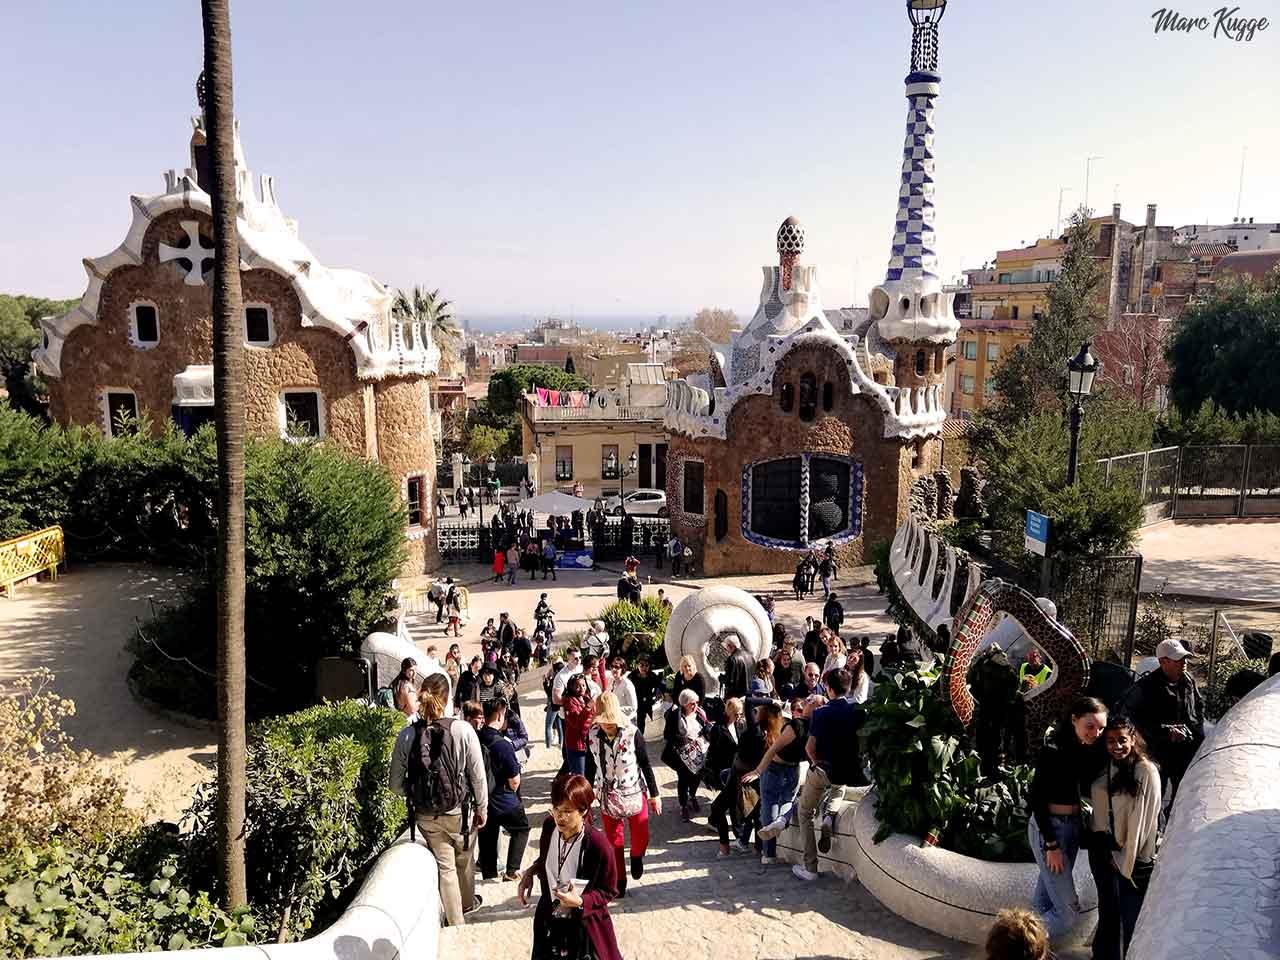 Park Guell Offnungszeiten 2021 Alle Tipps Infos Hallo Barcelona